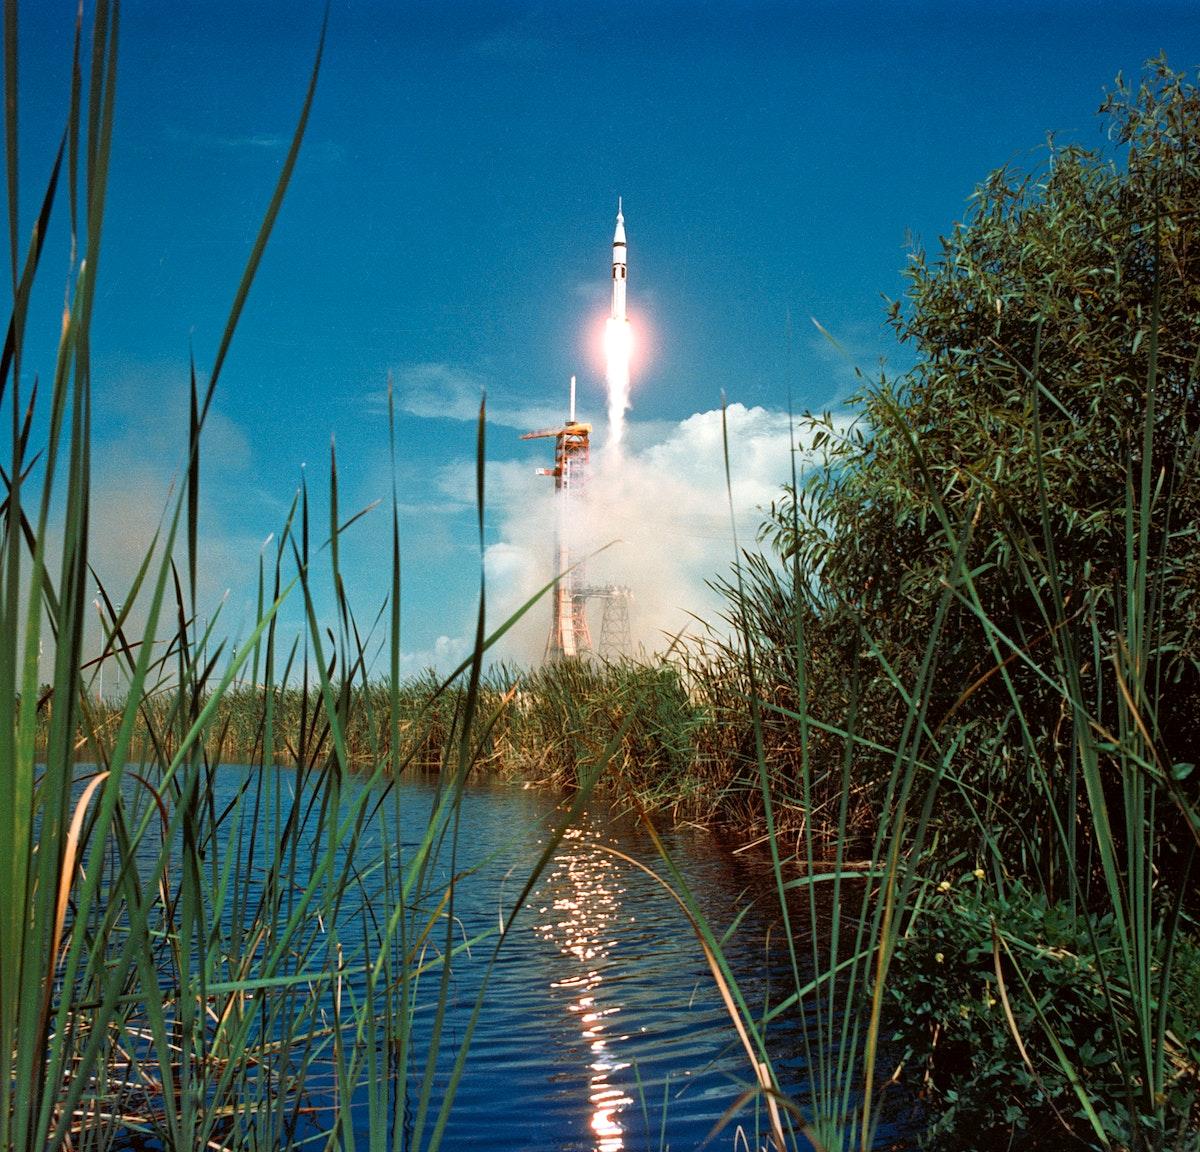 Liftoff - Apollo-Soyuz Test Project (ASTP) - KSC